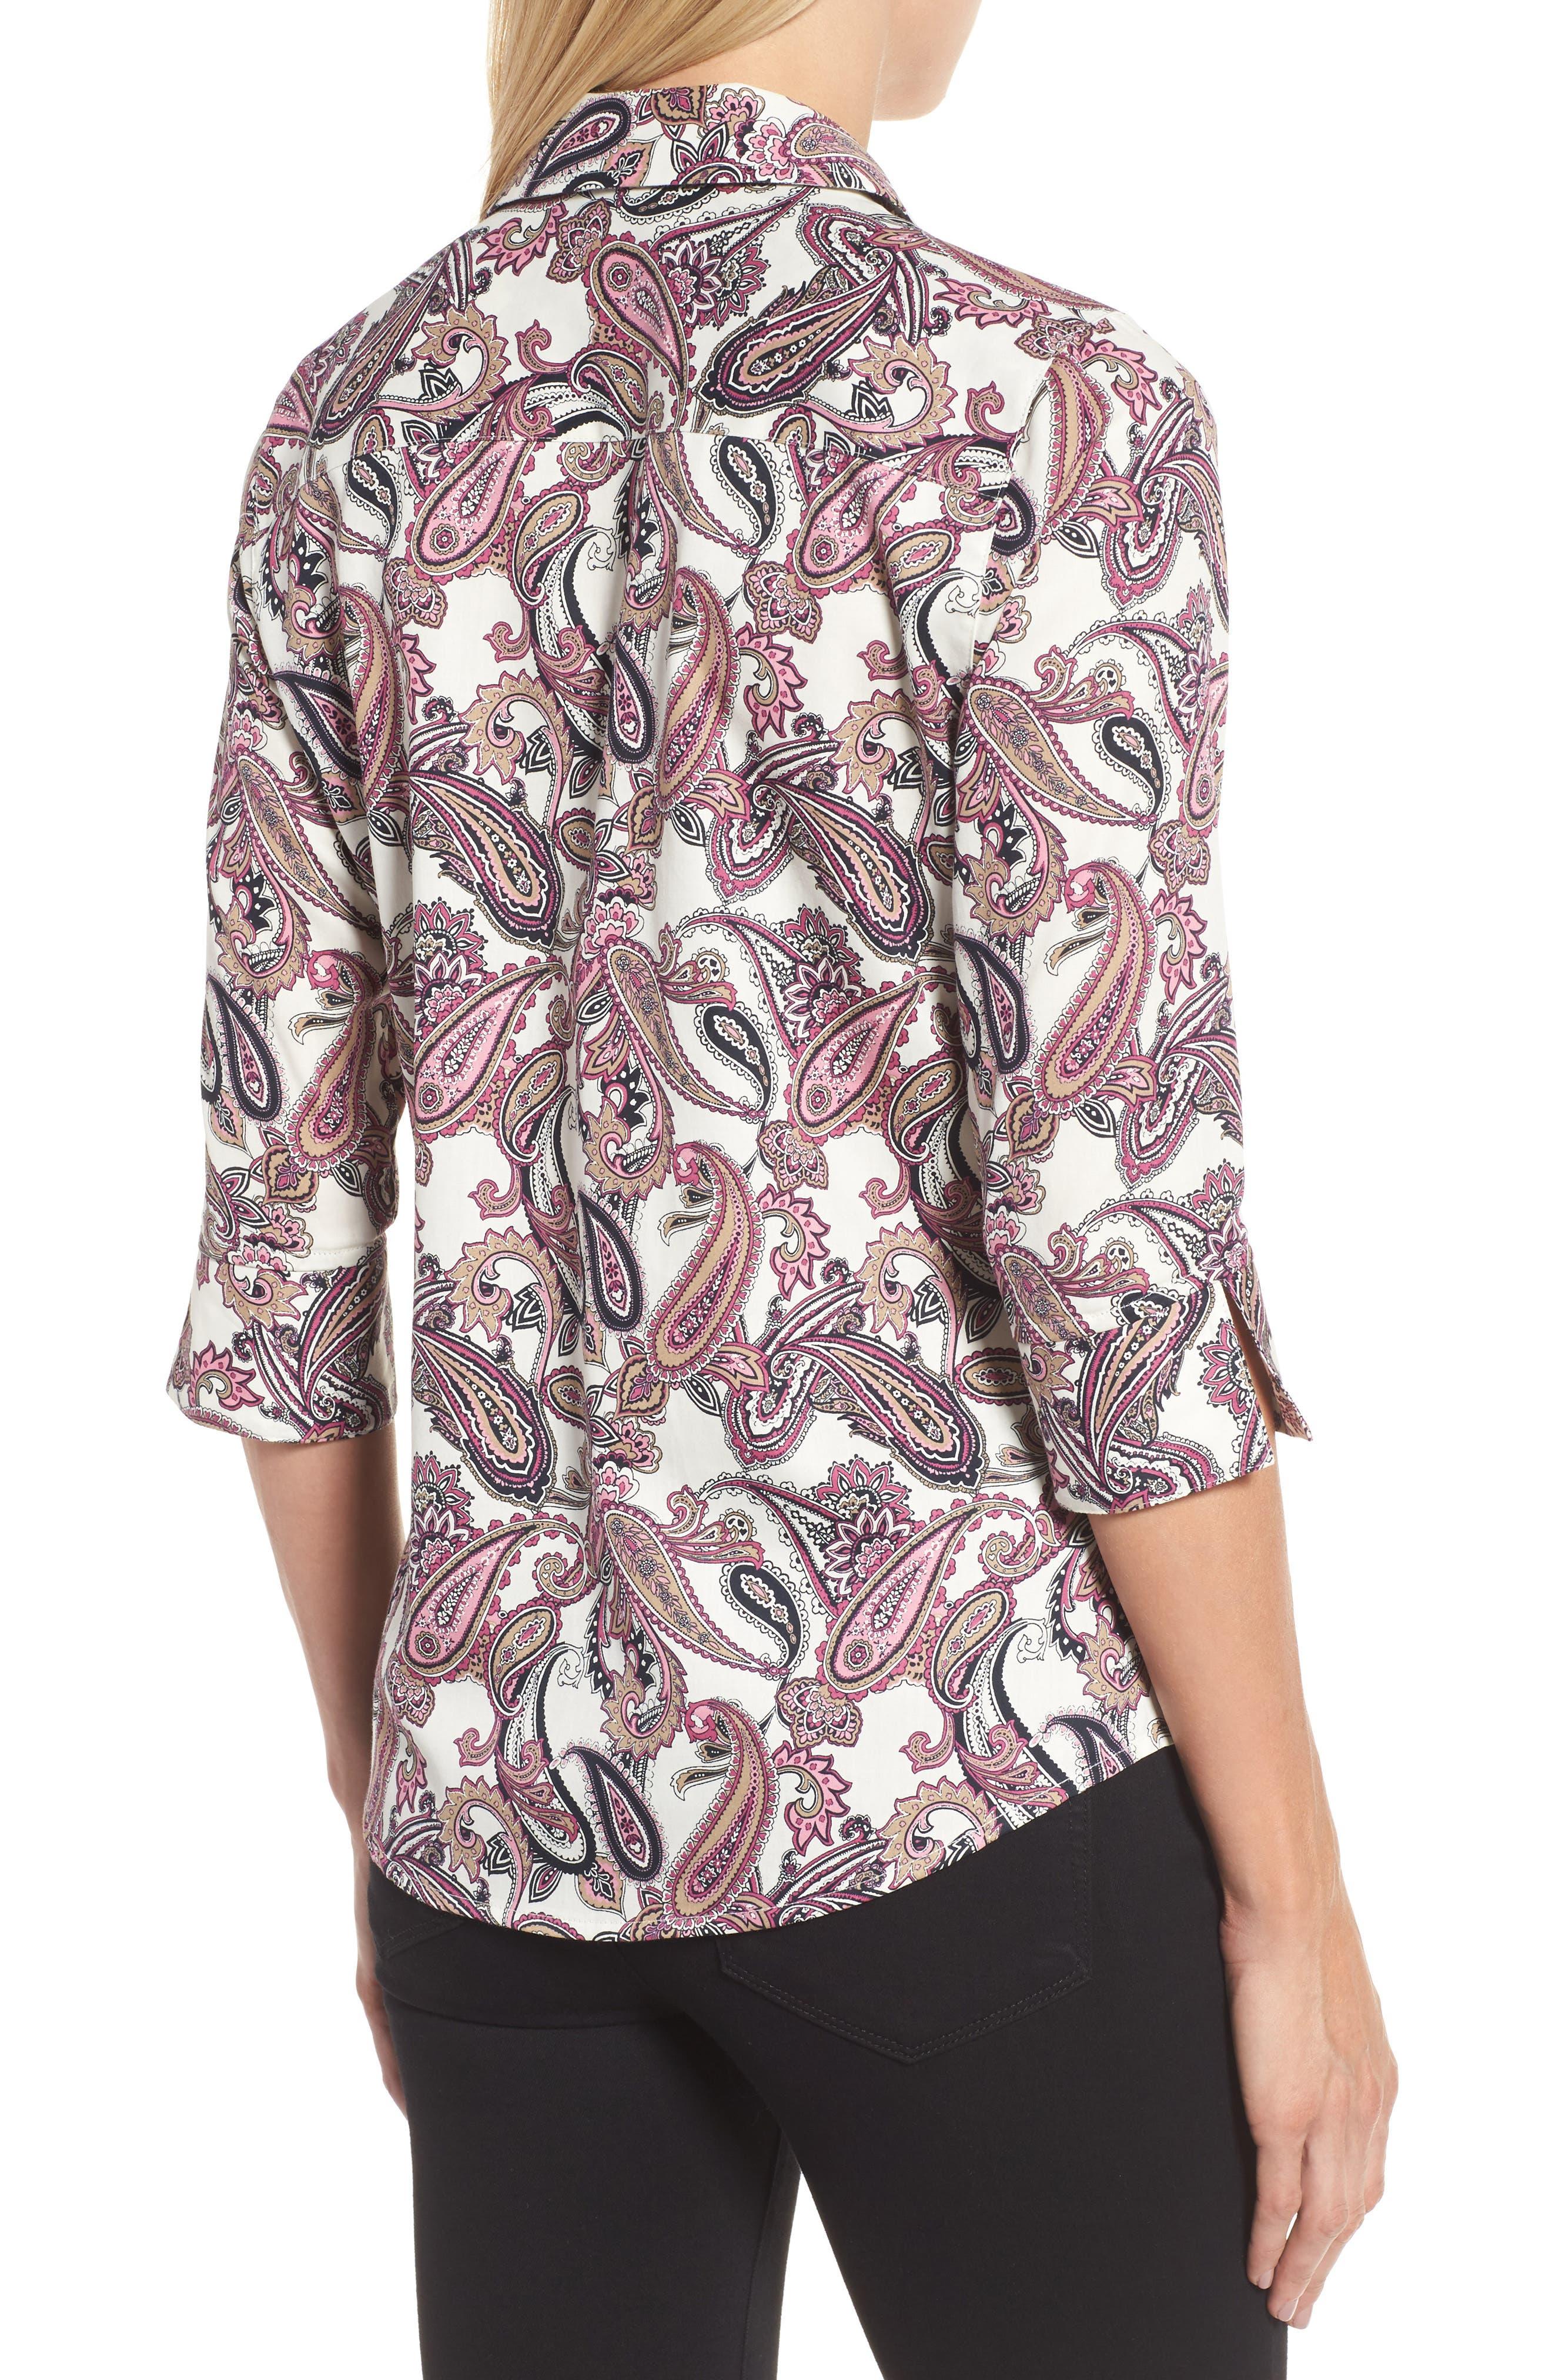 Mary Paisley Wrinkle Free Shirt,                             Alternate thumbnail 2, color,                             935